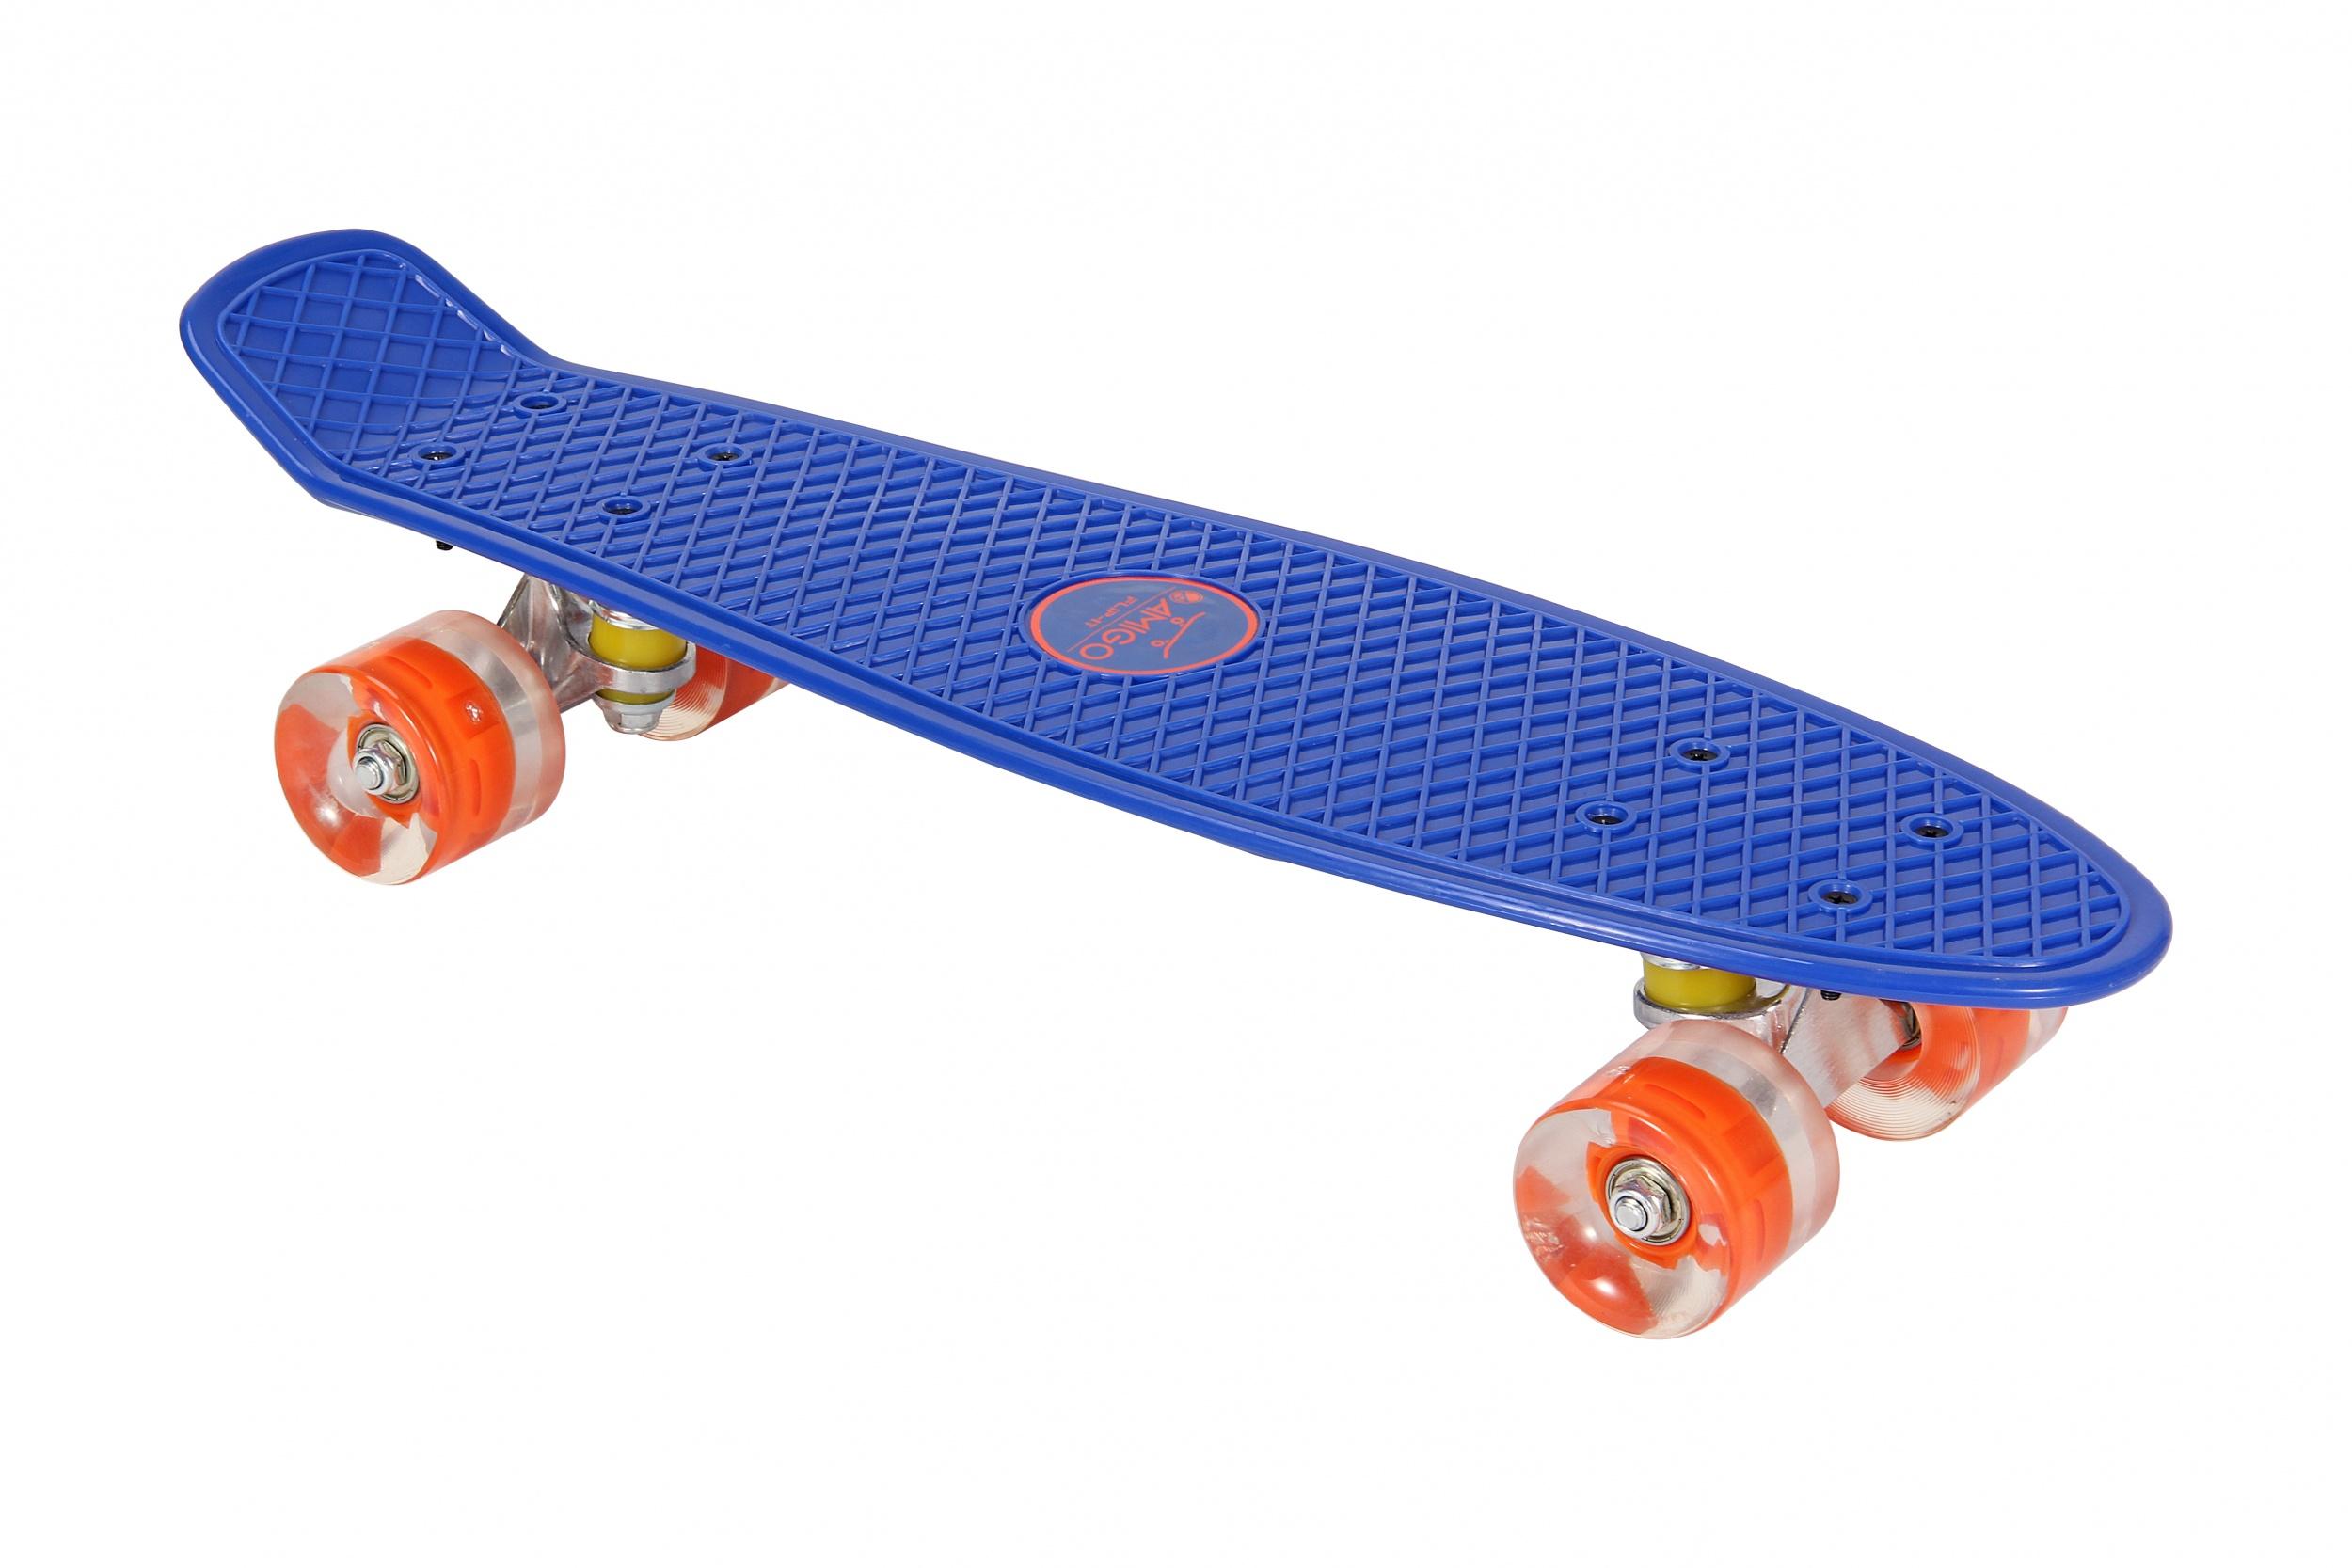 Skateboard met Led-verlichting blauw - oranje